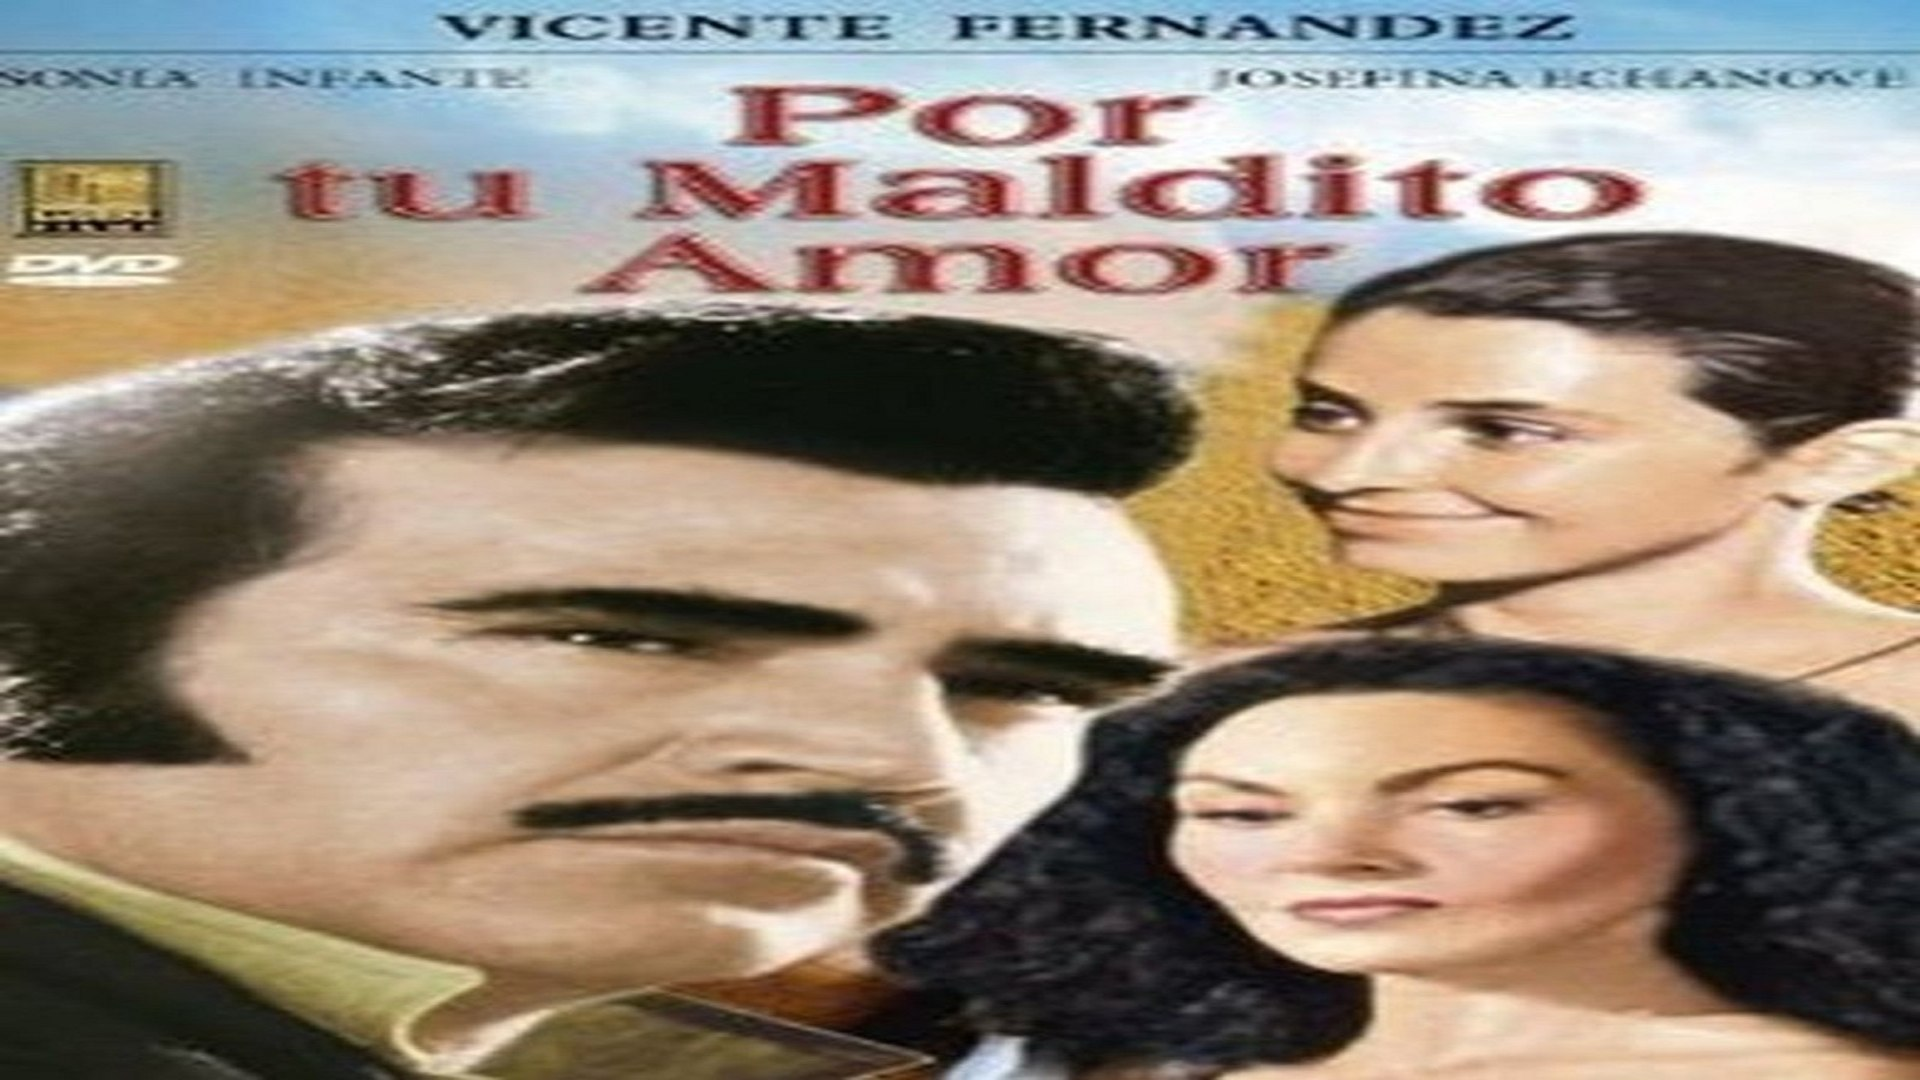 Por Tu Maldito Amor Vicente Fernandez Pelicula Parte 1 2 Vídeo Dailymotion